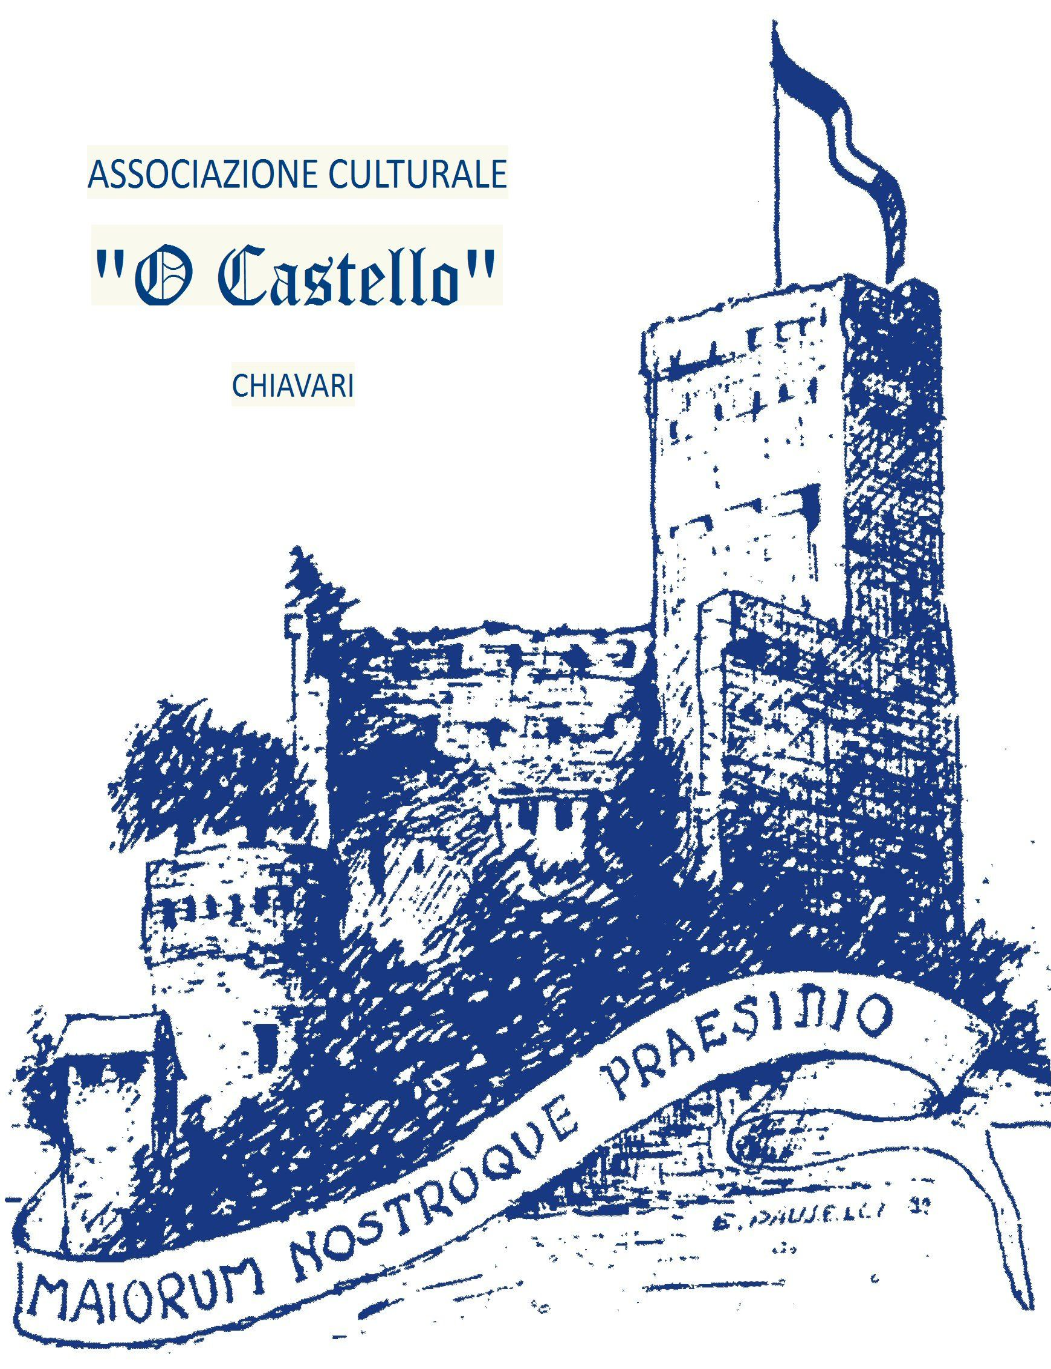 O Castello